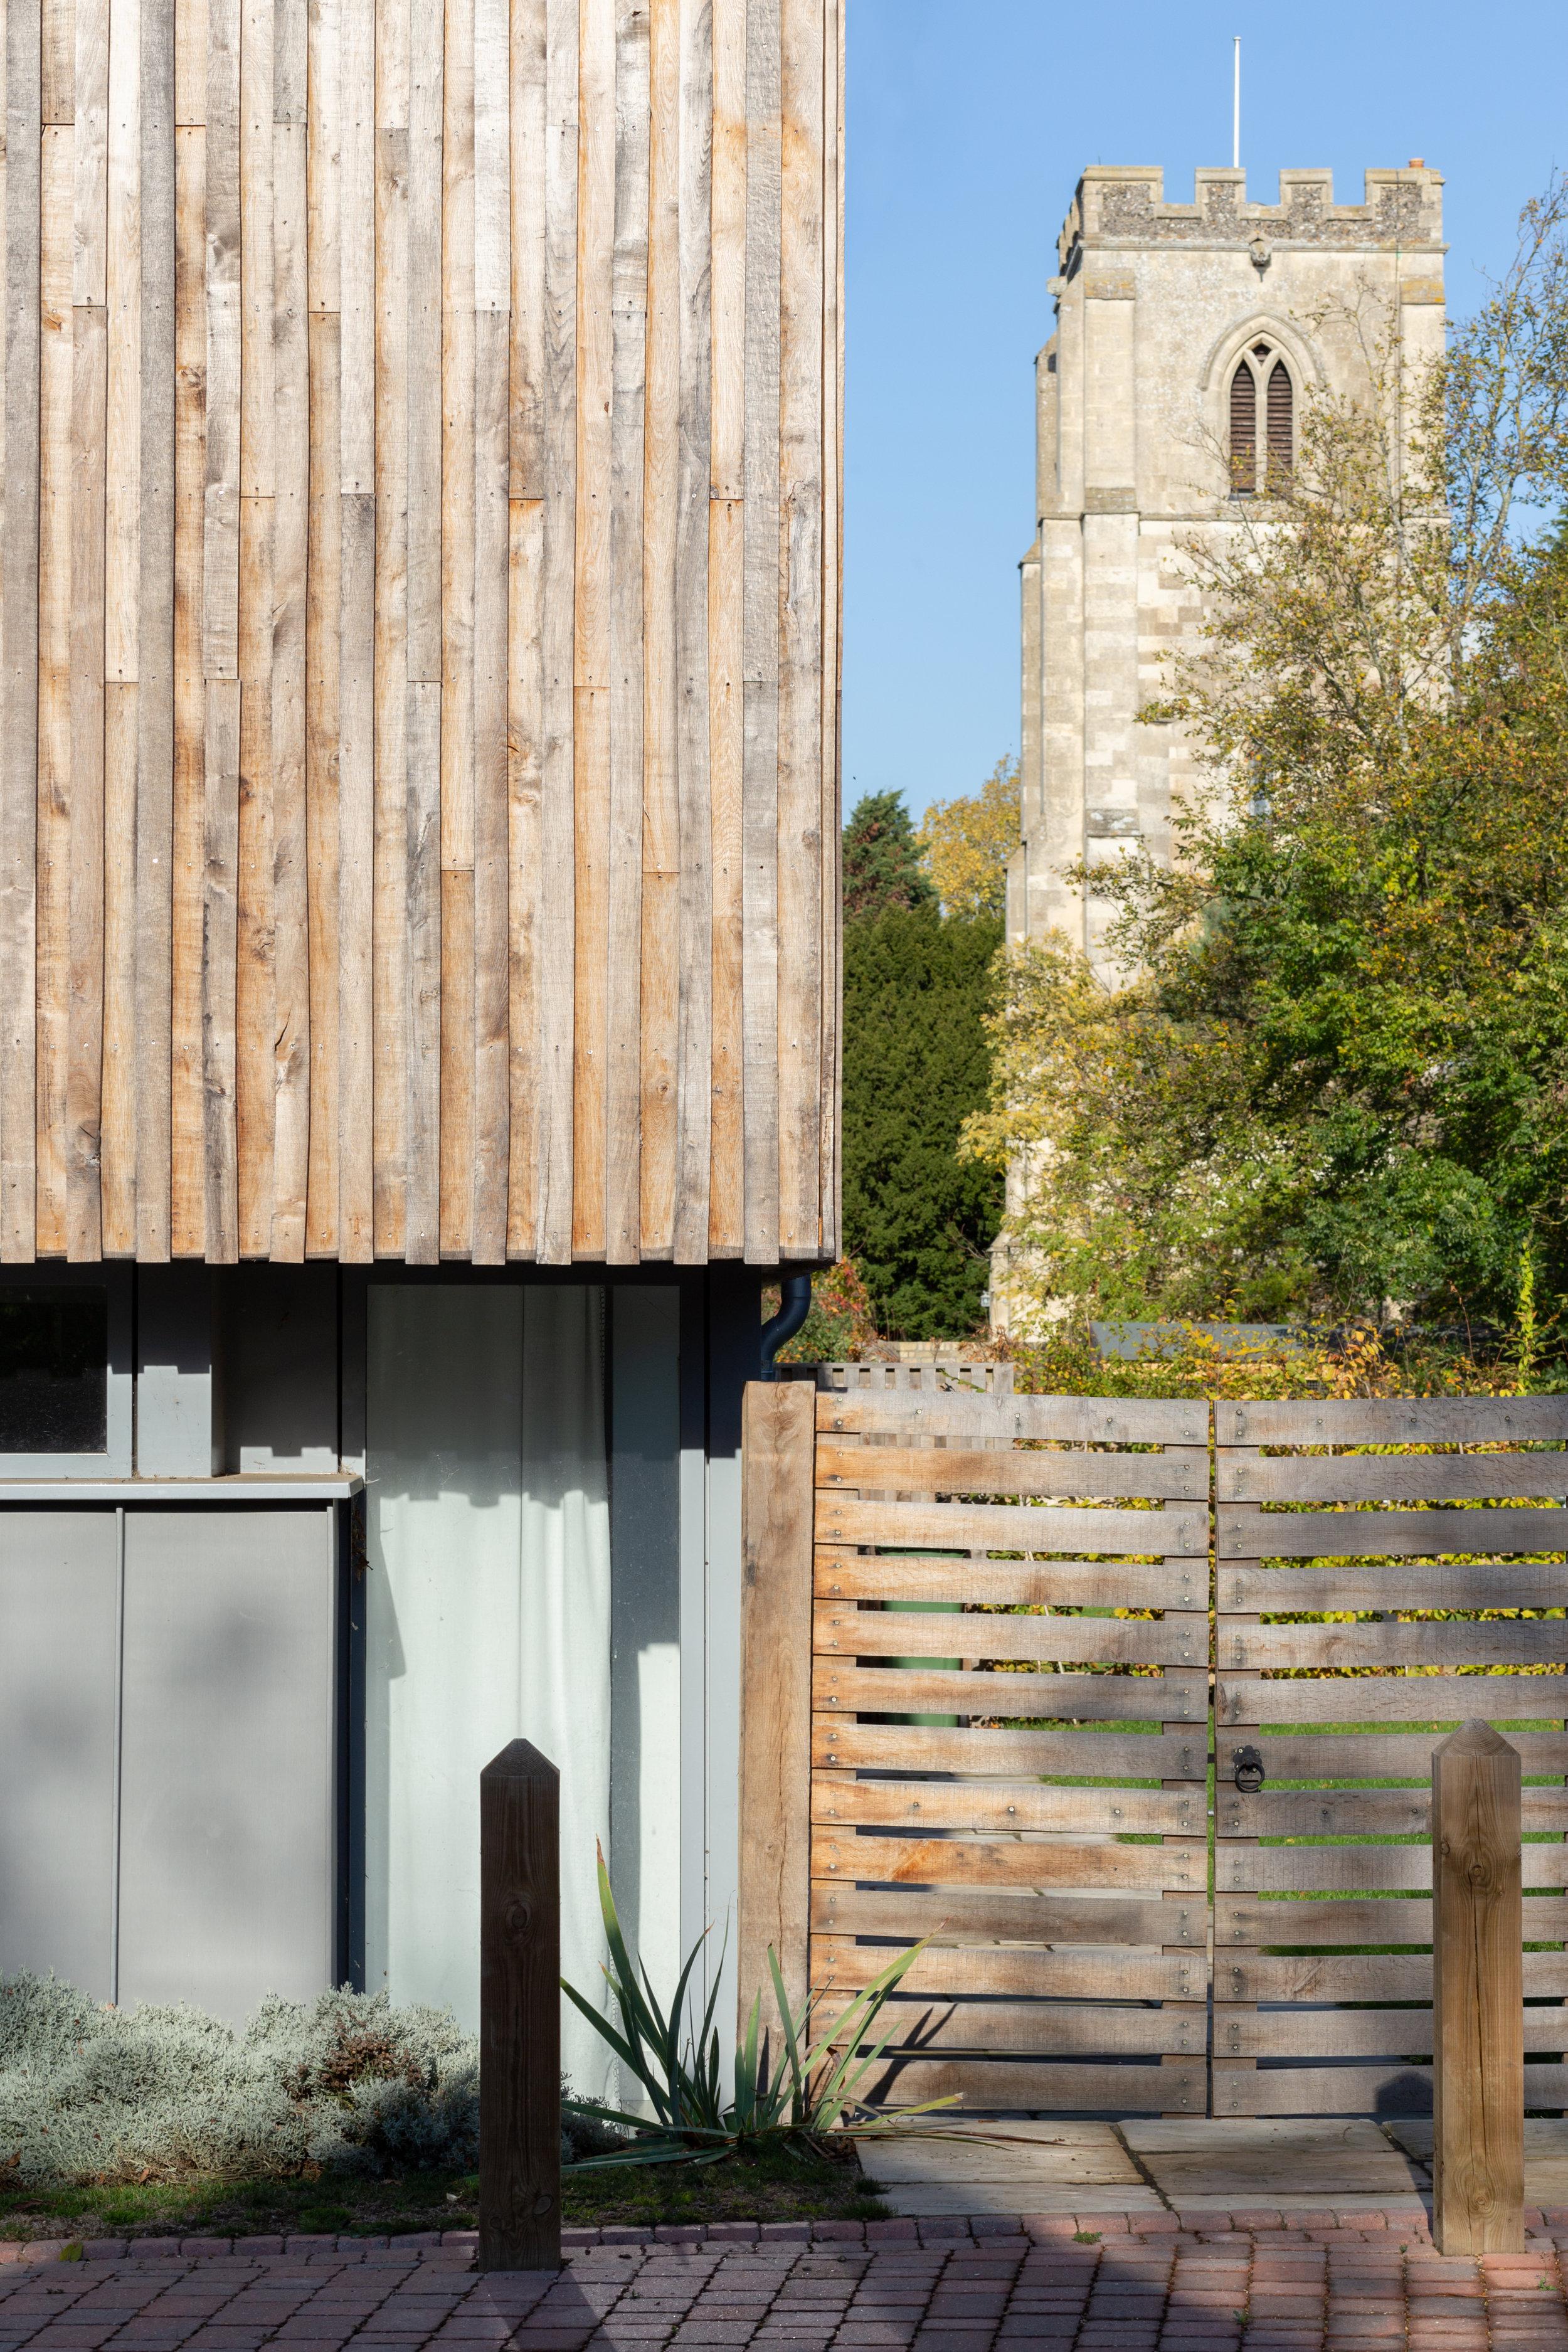 CGA_Anstey Hall Barns_IMG_5380-Edit.jpg